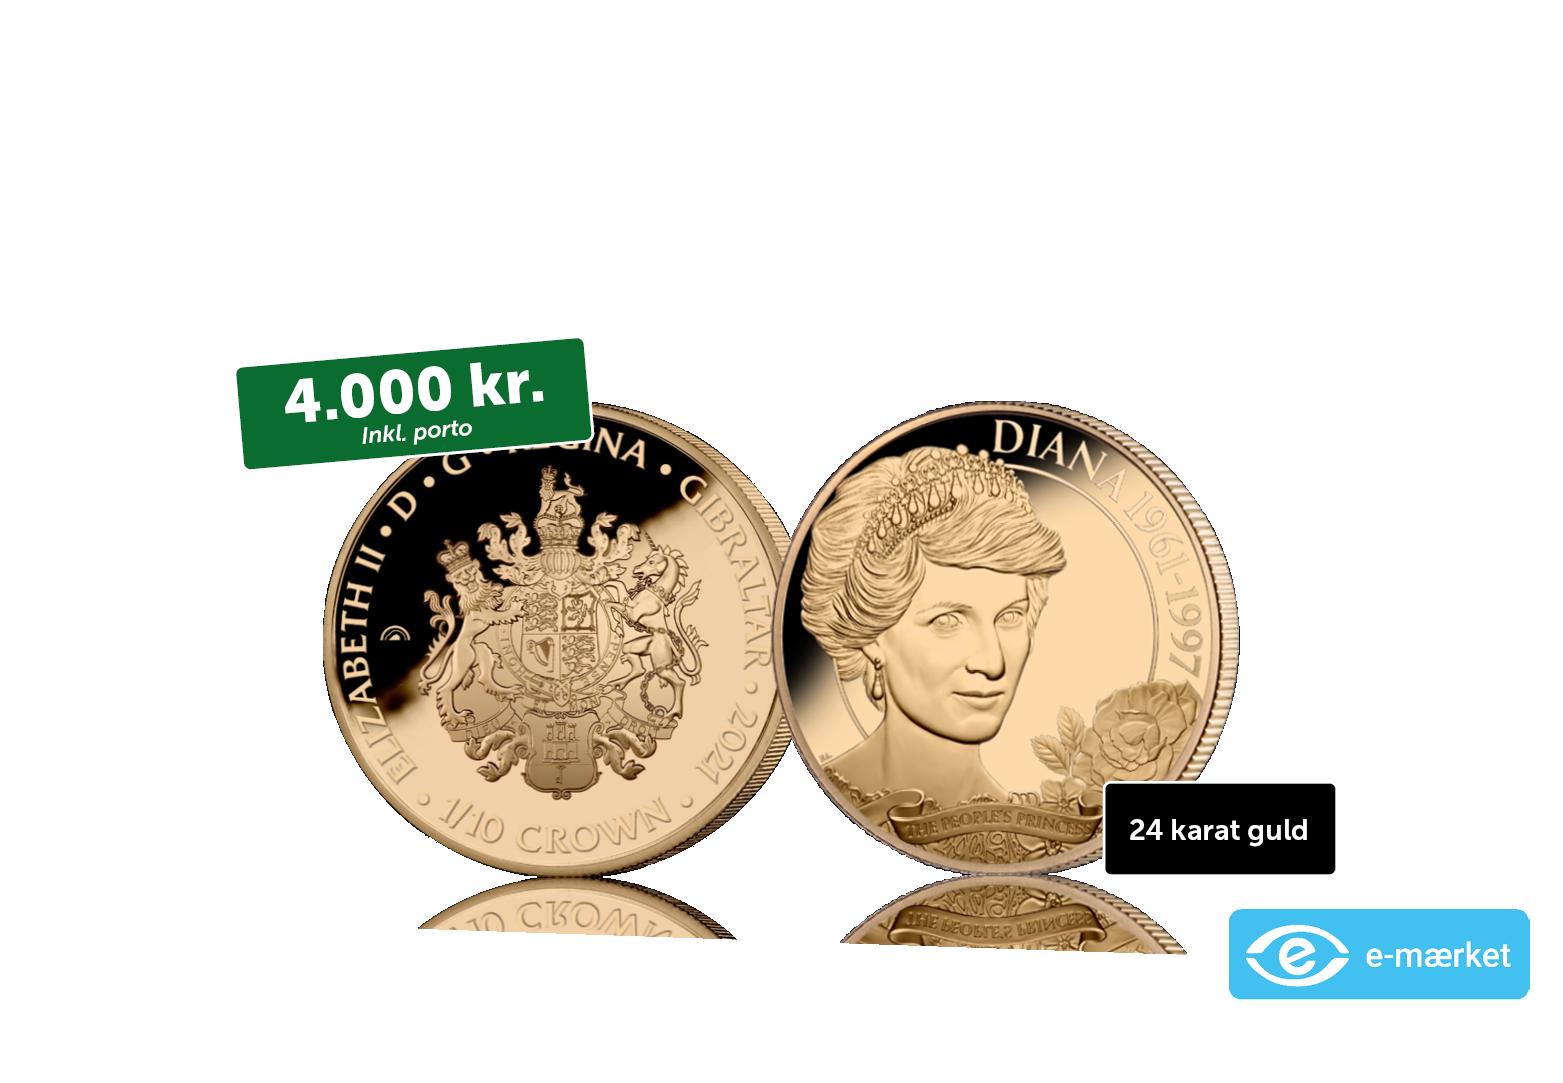 24 karat guldmønt - The English Rose 1/10 crown 2021